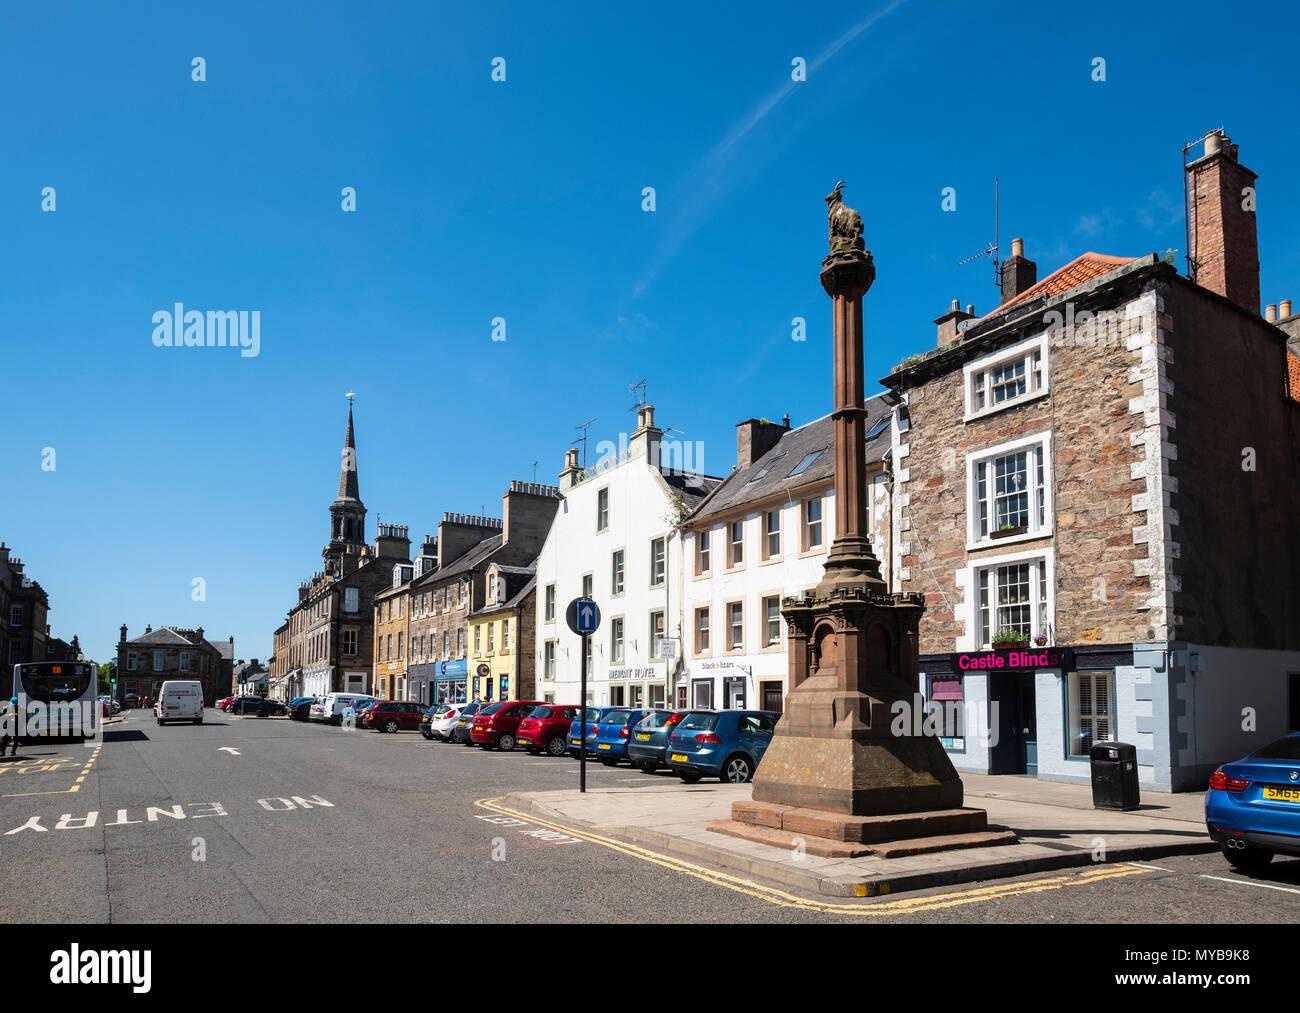 View of the High Street and Mercat in Haddington , East Lothian, Scotland, UK - Stock Image